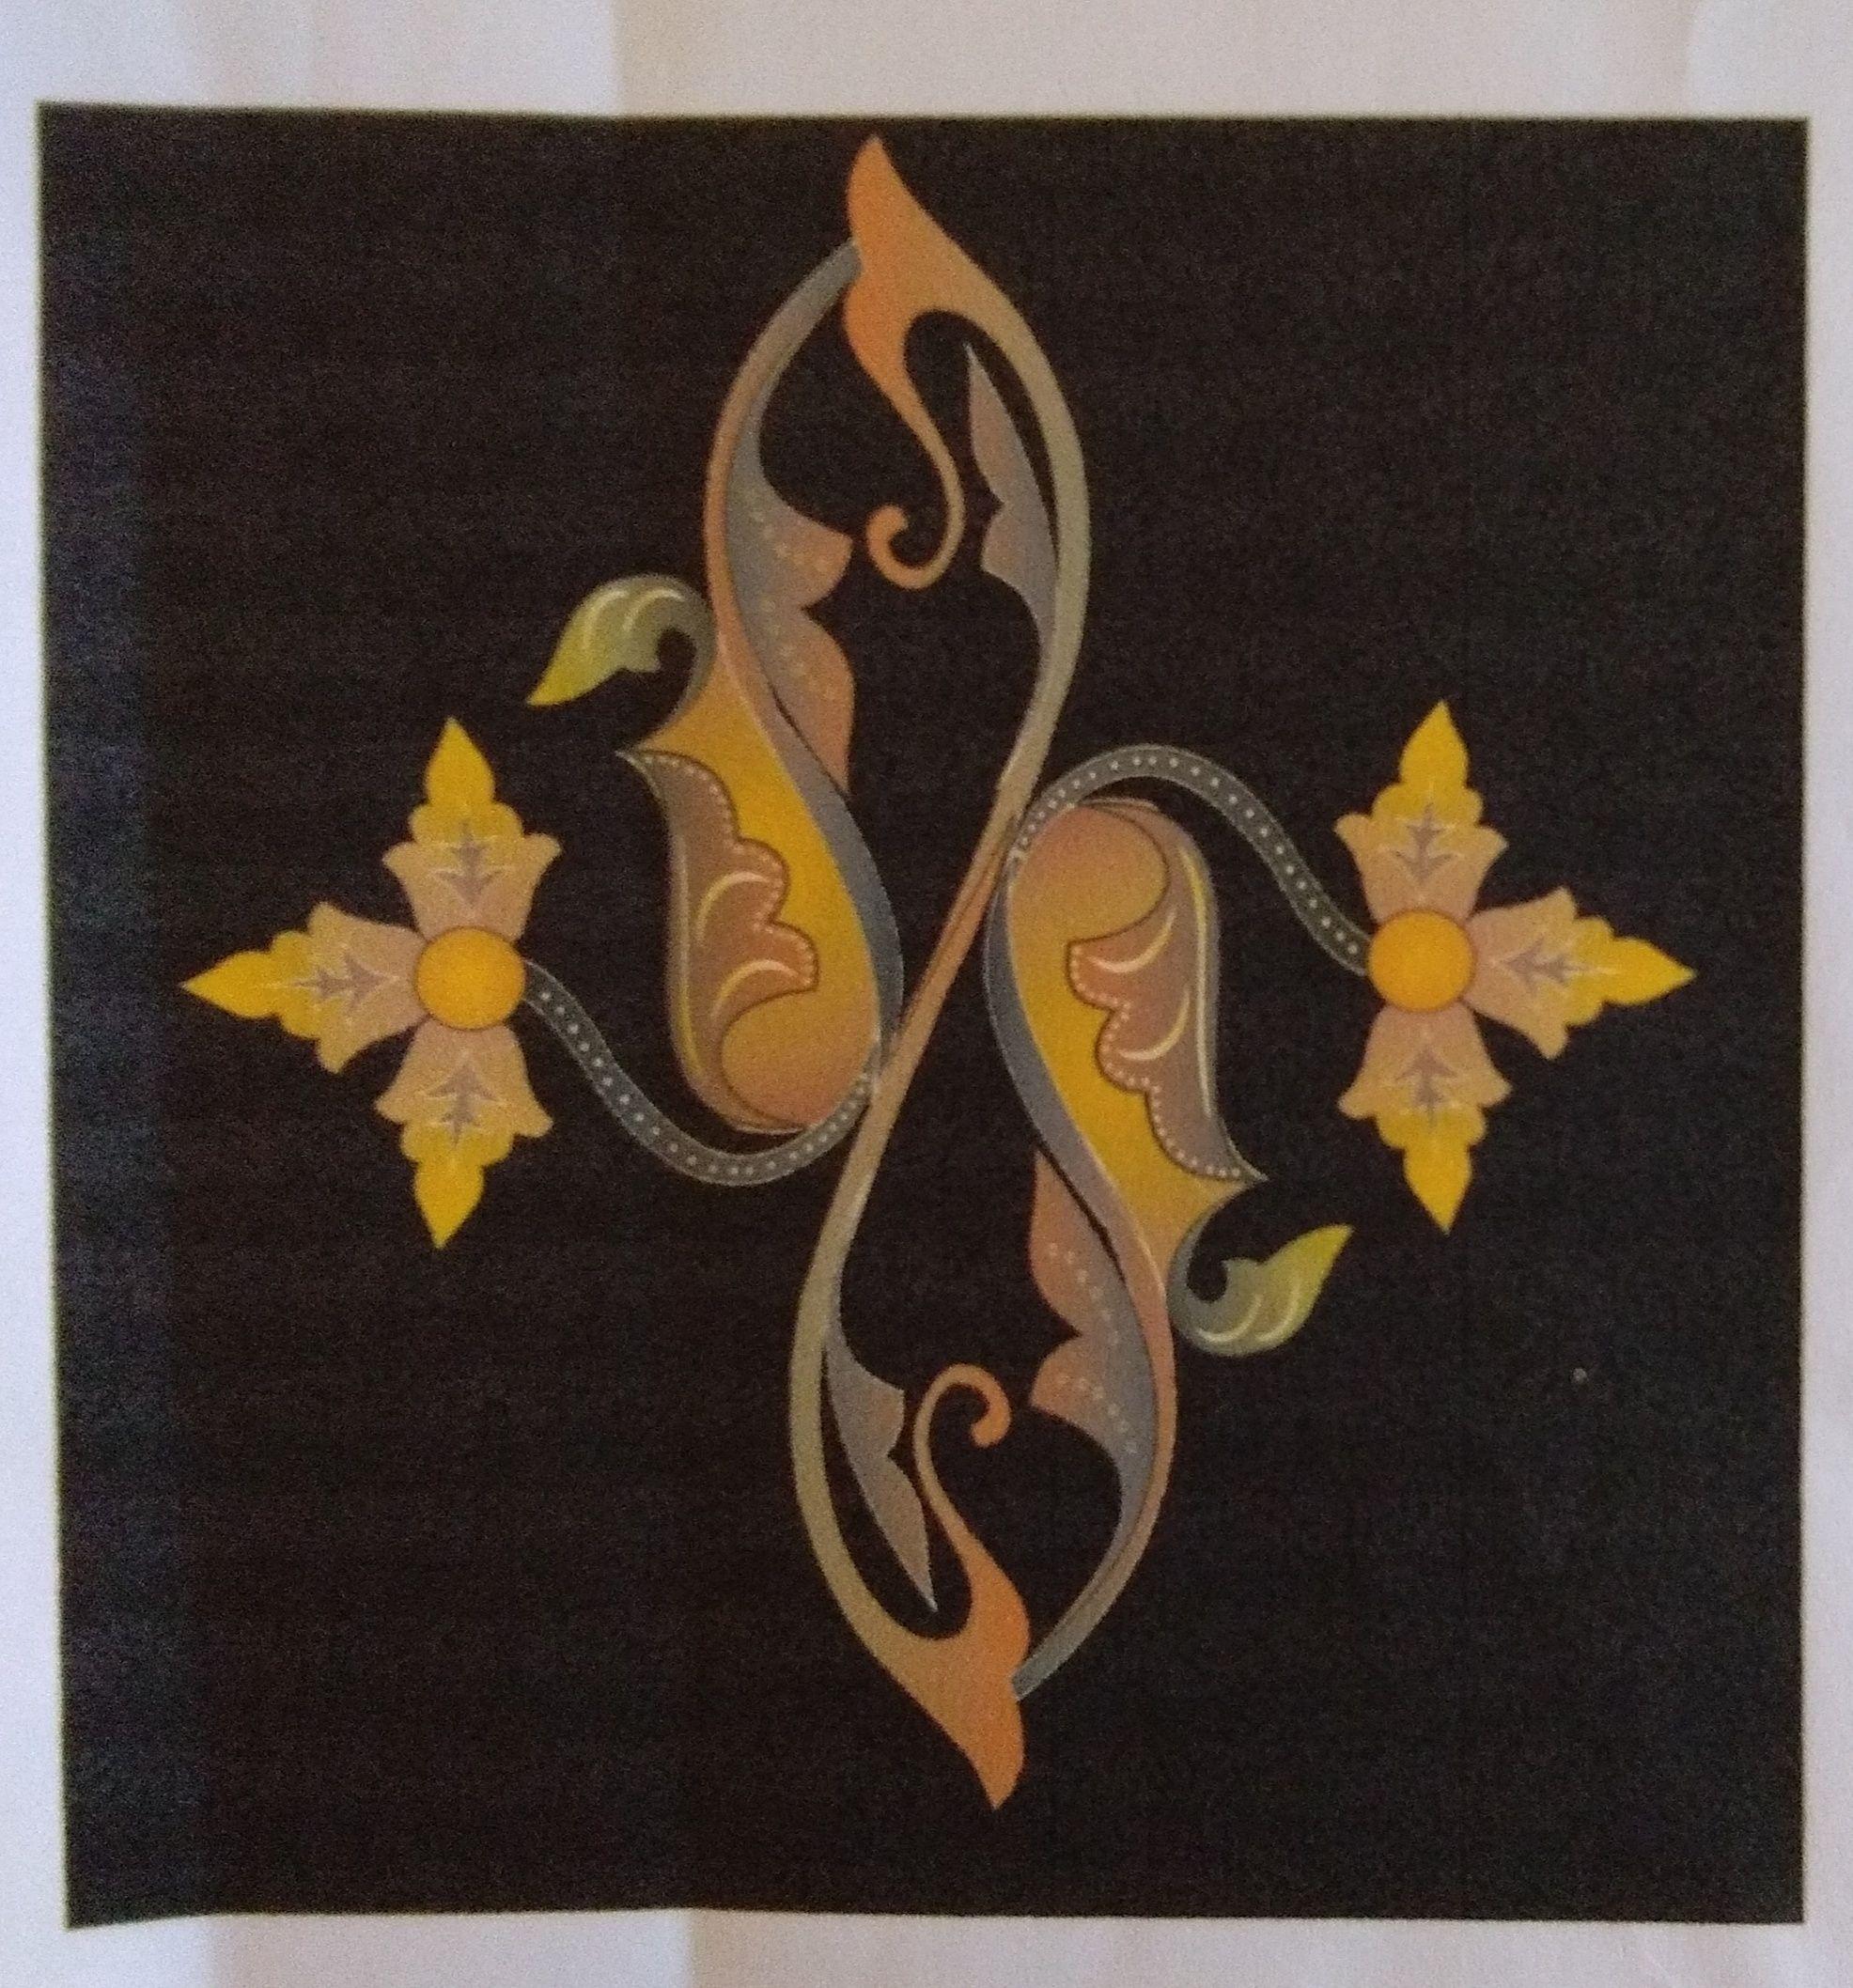 Inspirasi Motif Batik Batam: dari Siput Gonggong hingga Bunga Hutan